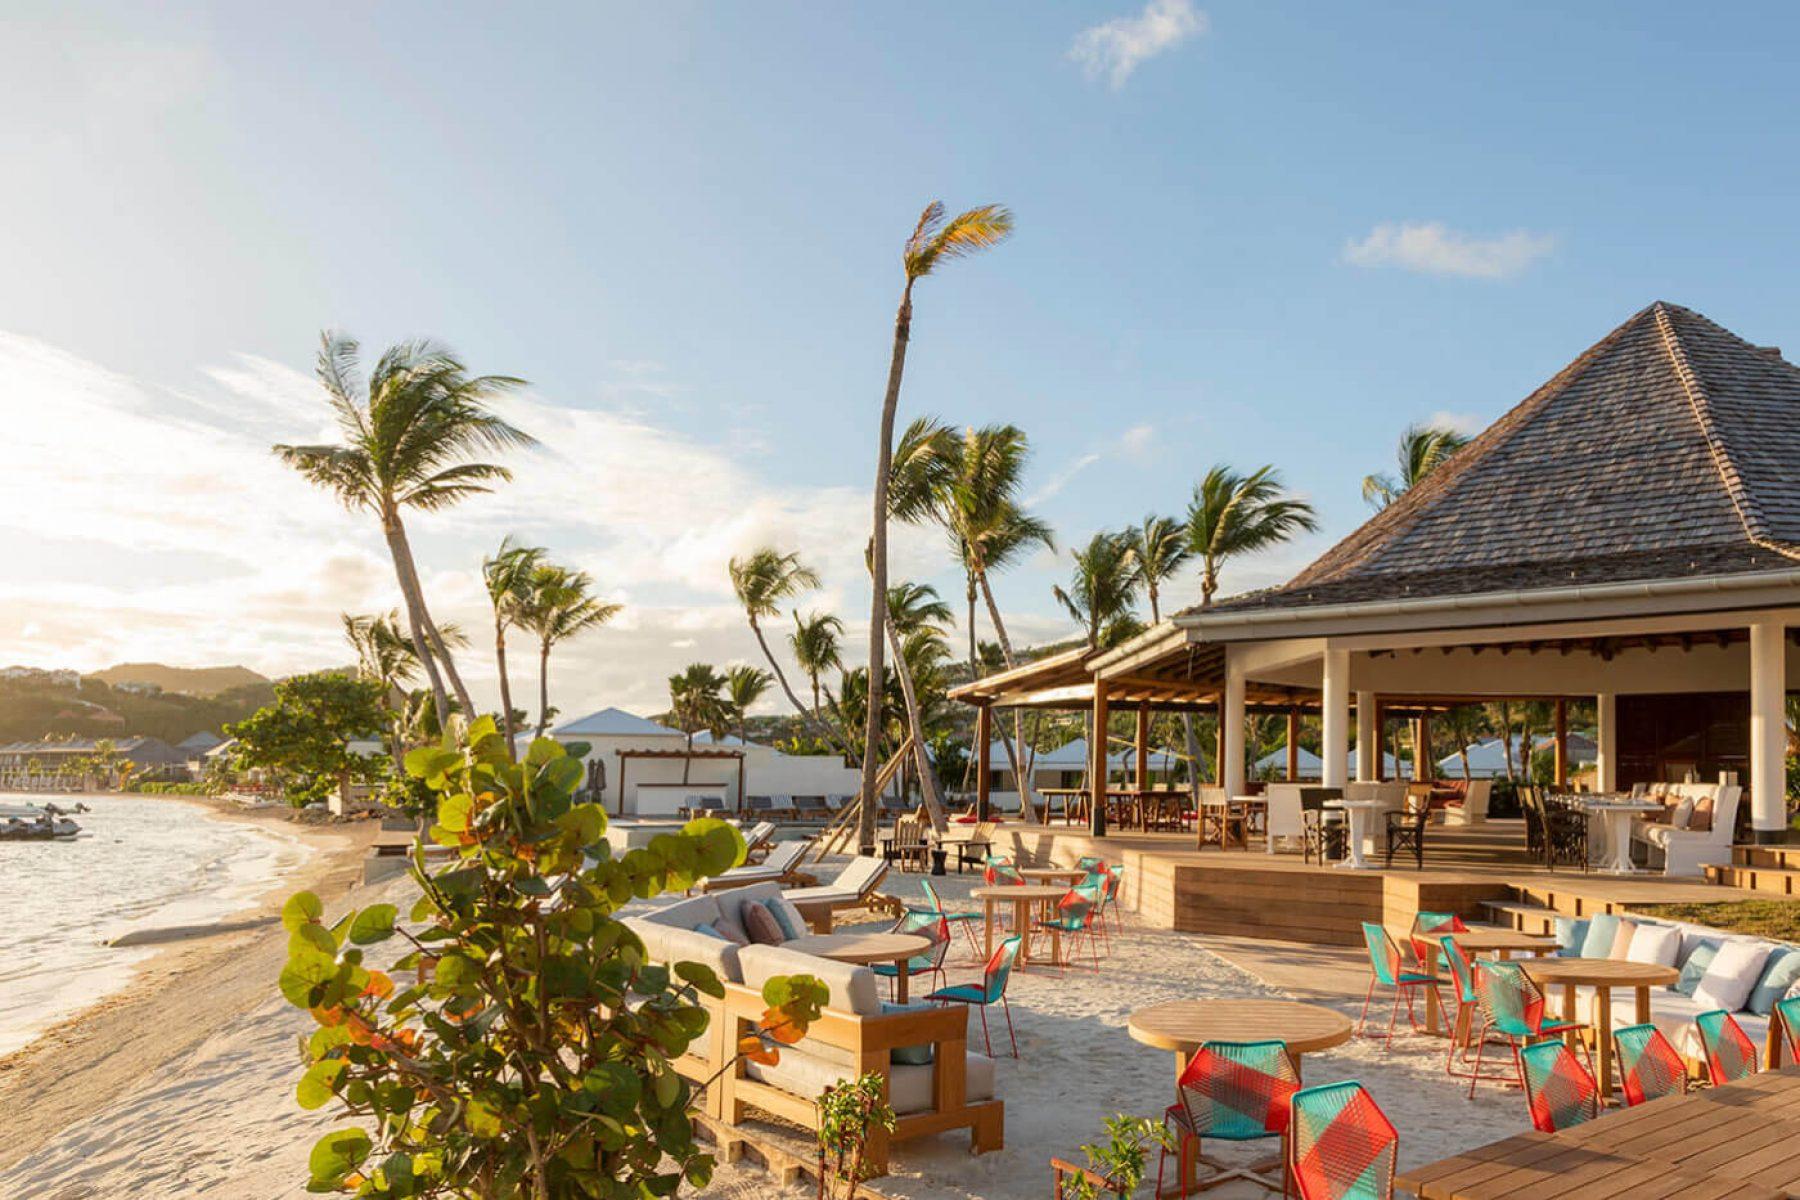 Le Sereno Surf Beach Restaurant in St Barts